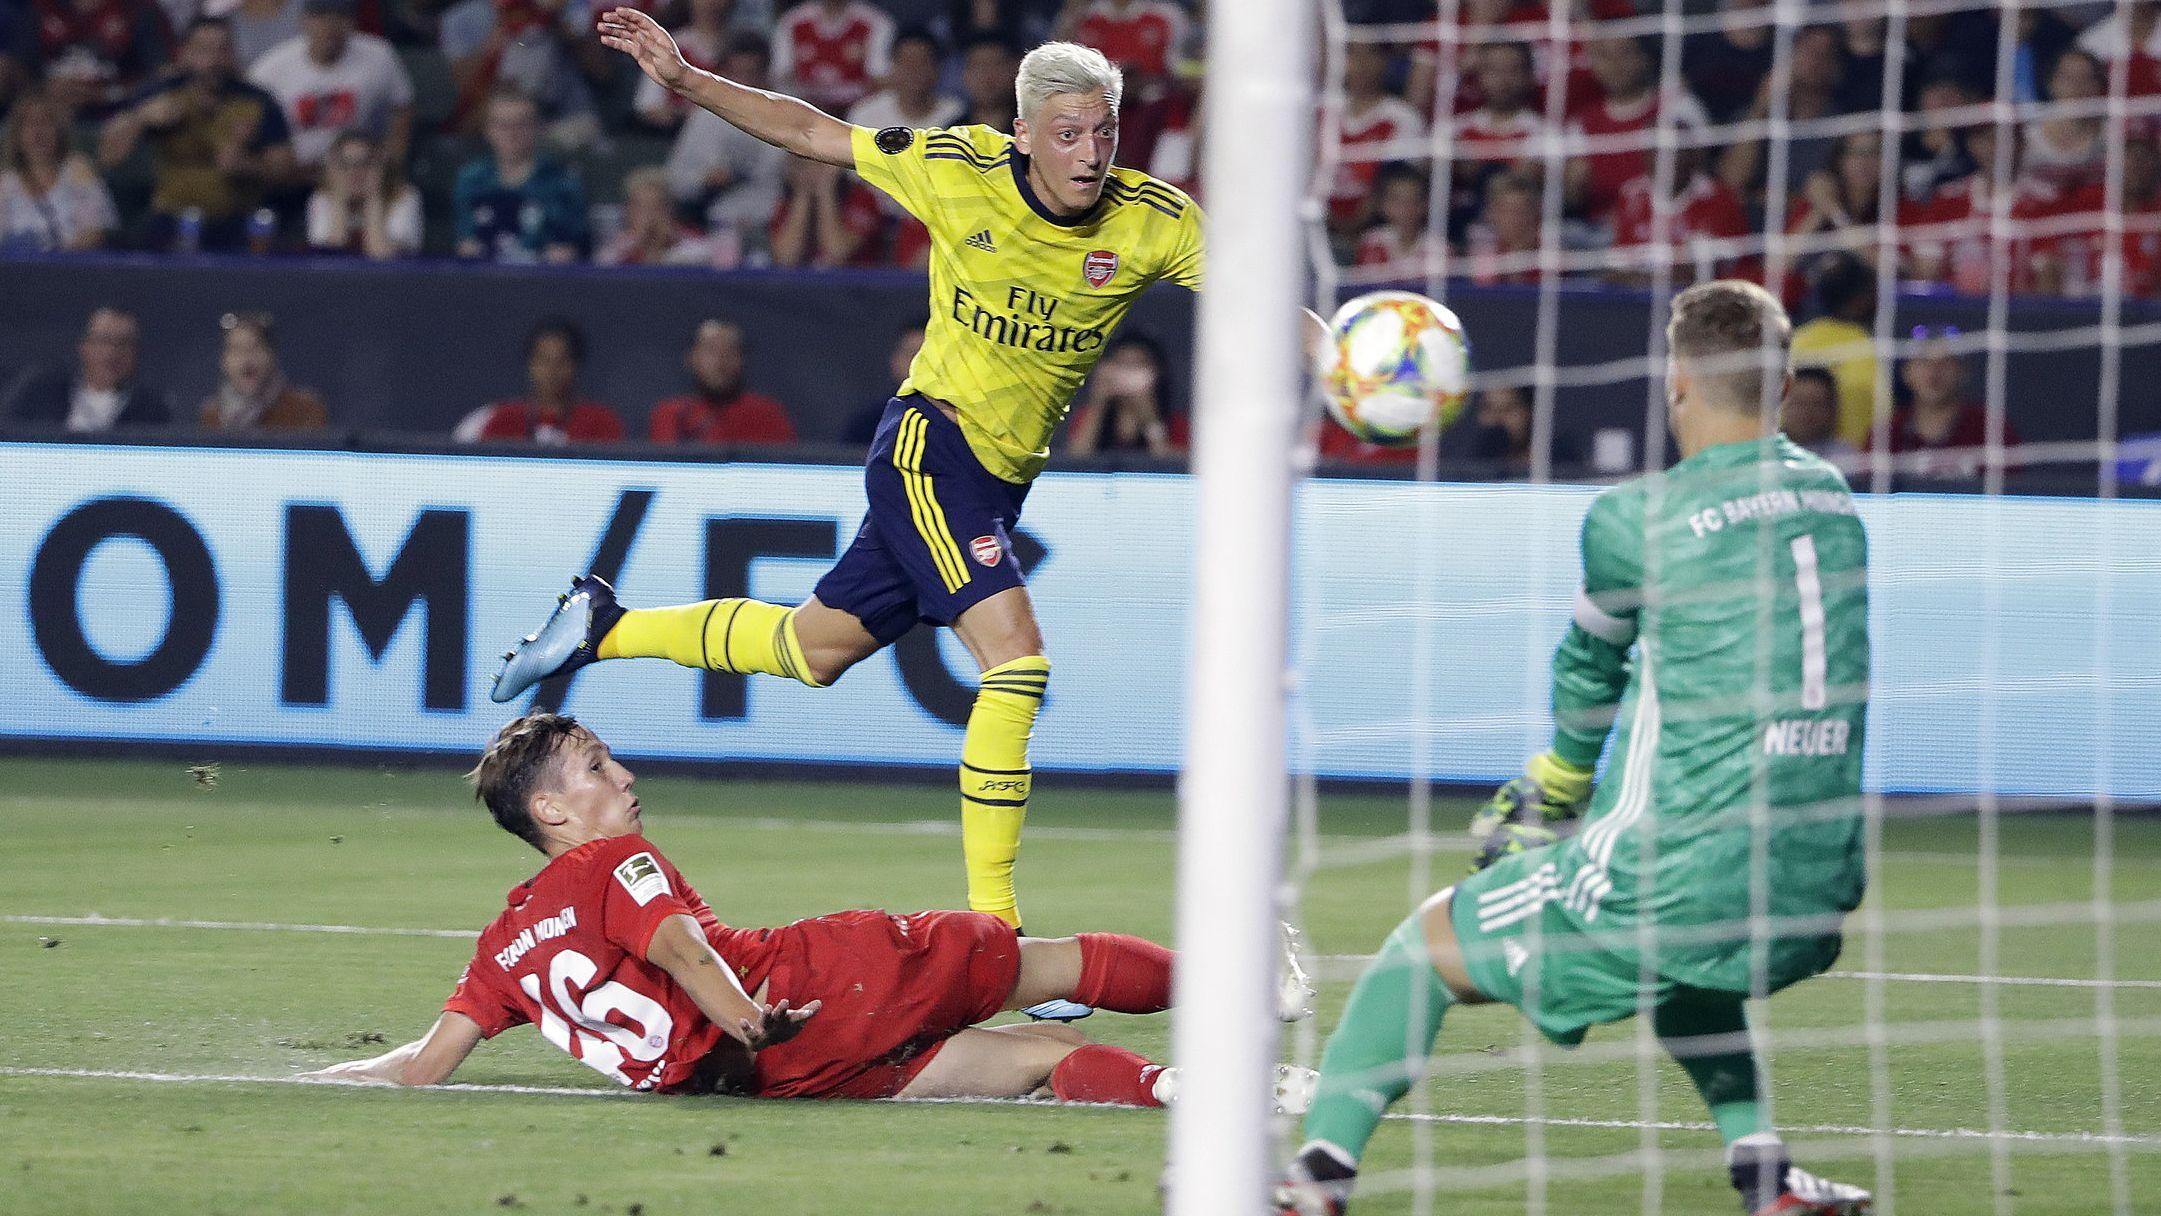 Jonas Kehl (l) und Torhüter ManuelNeuer (r) gegen Arsenals Mesut Özil.